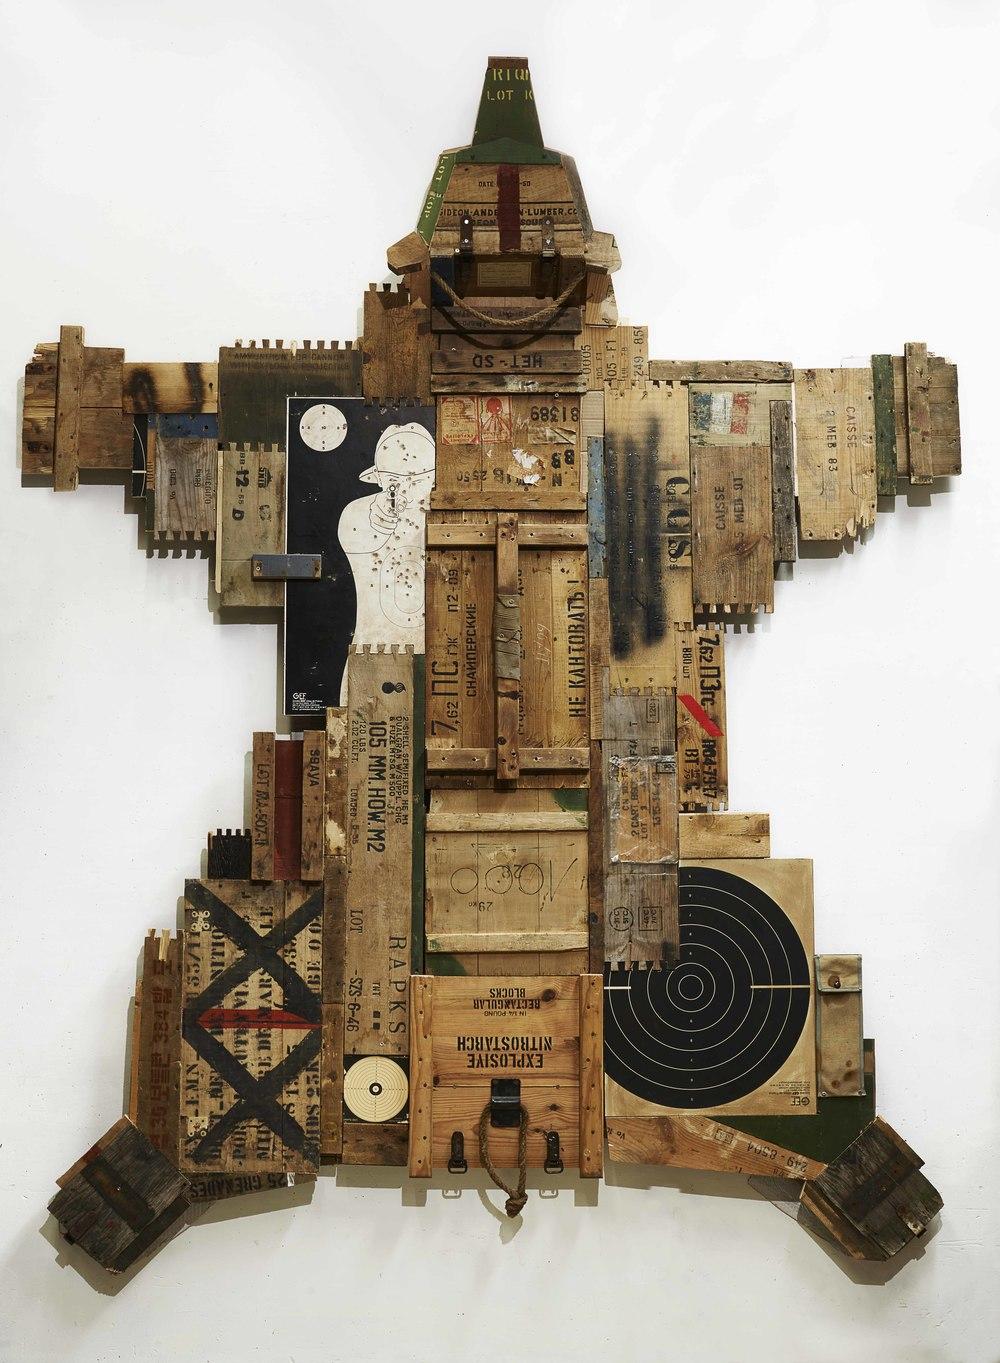 Dimitri Tsykalov, Skin XIV, 2015. Amunition Boxes, 225 x 220 x 25 cm